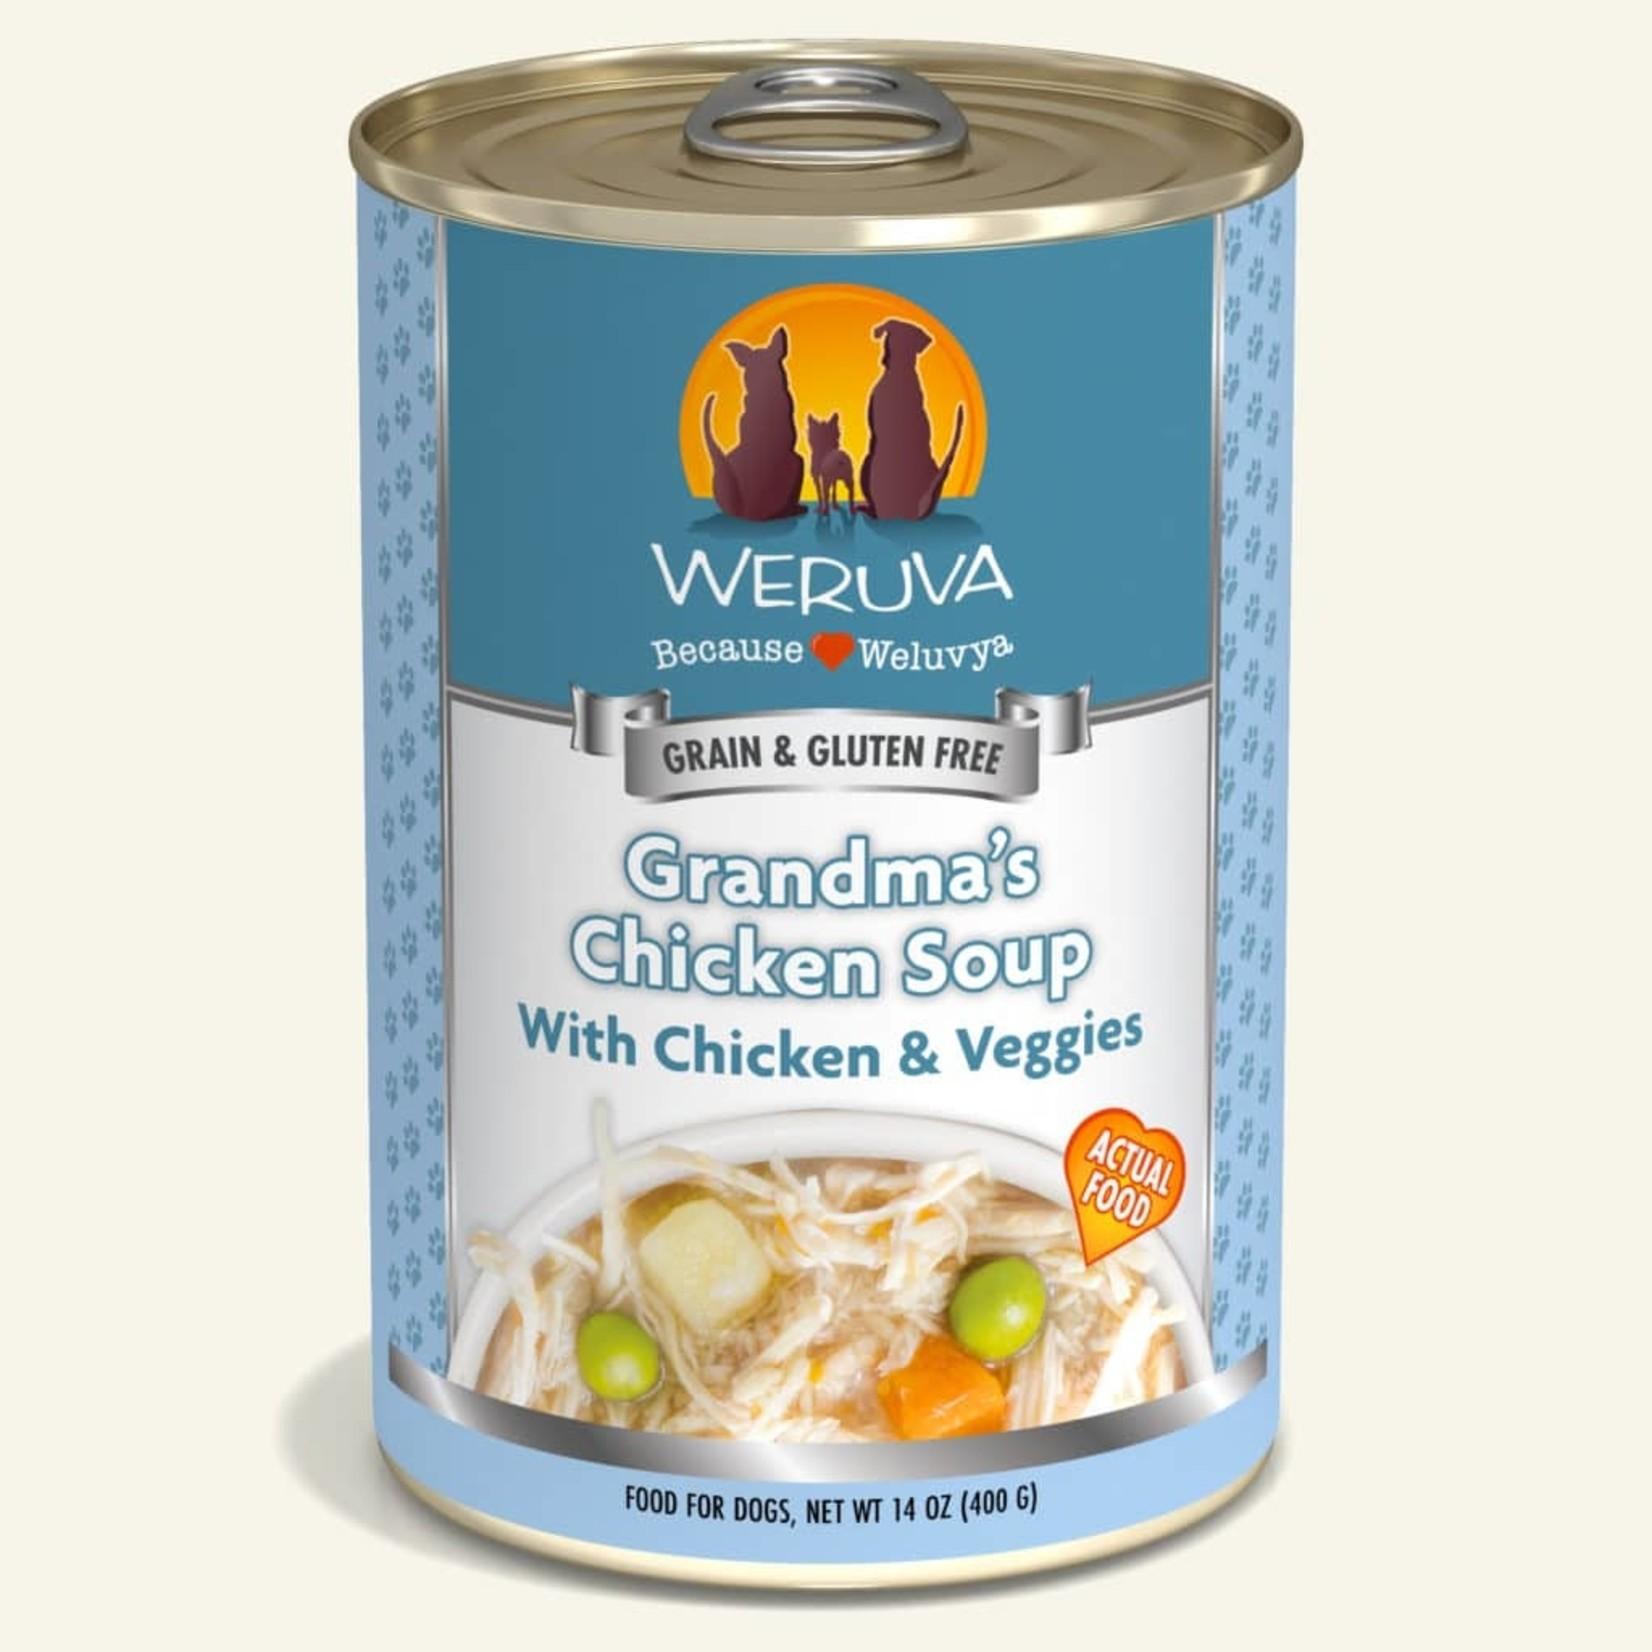 Weruva Inc. Weruva Dog Grain Free Grandma's Chicken Soup 14 OZ